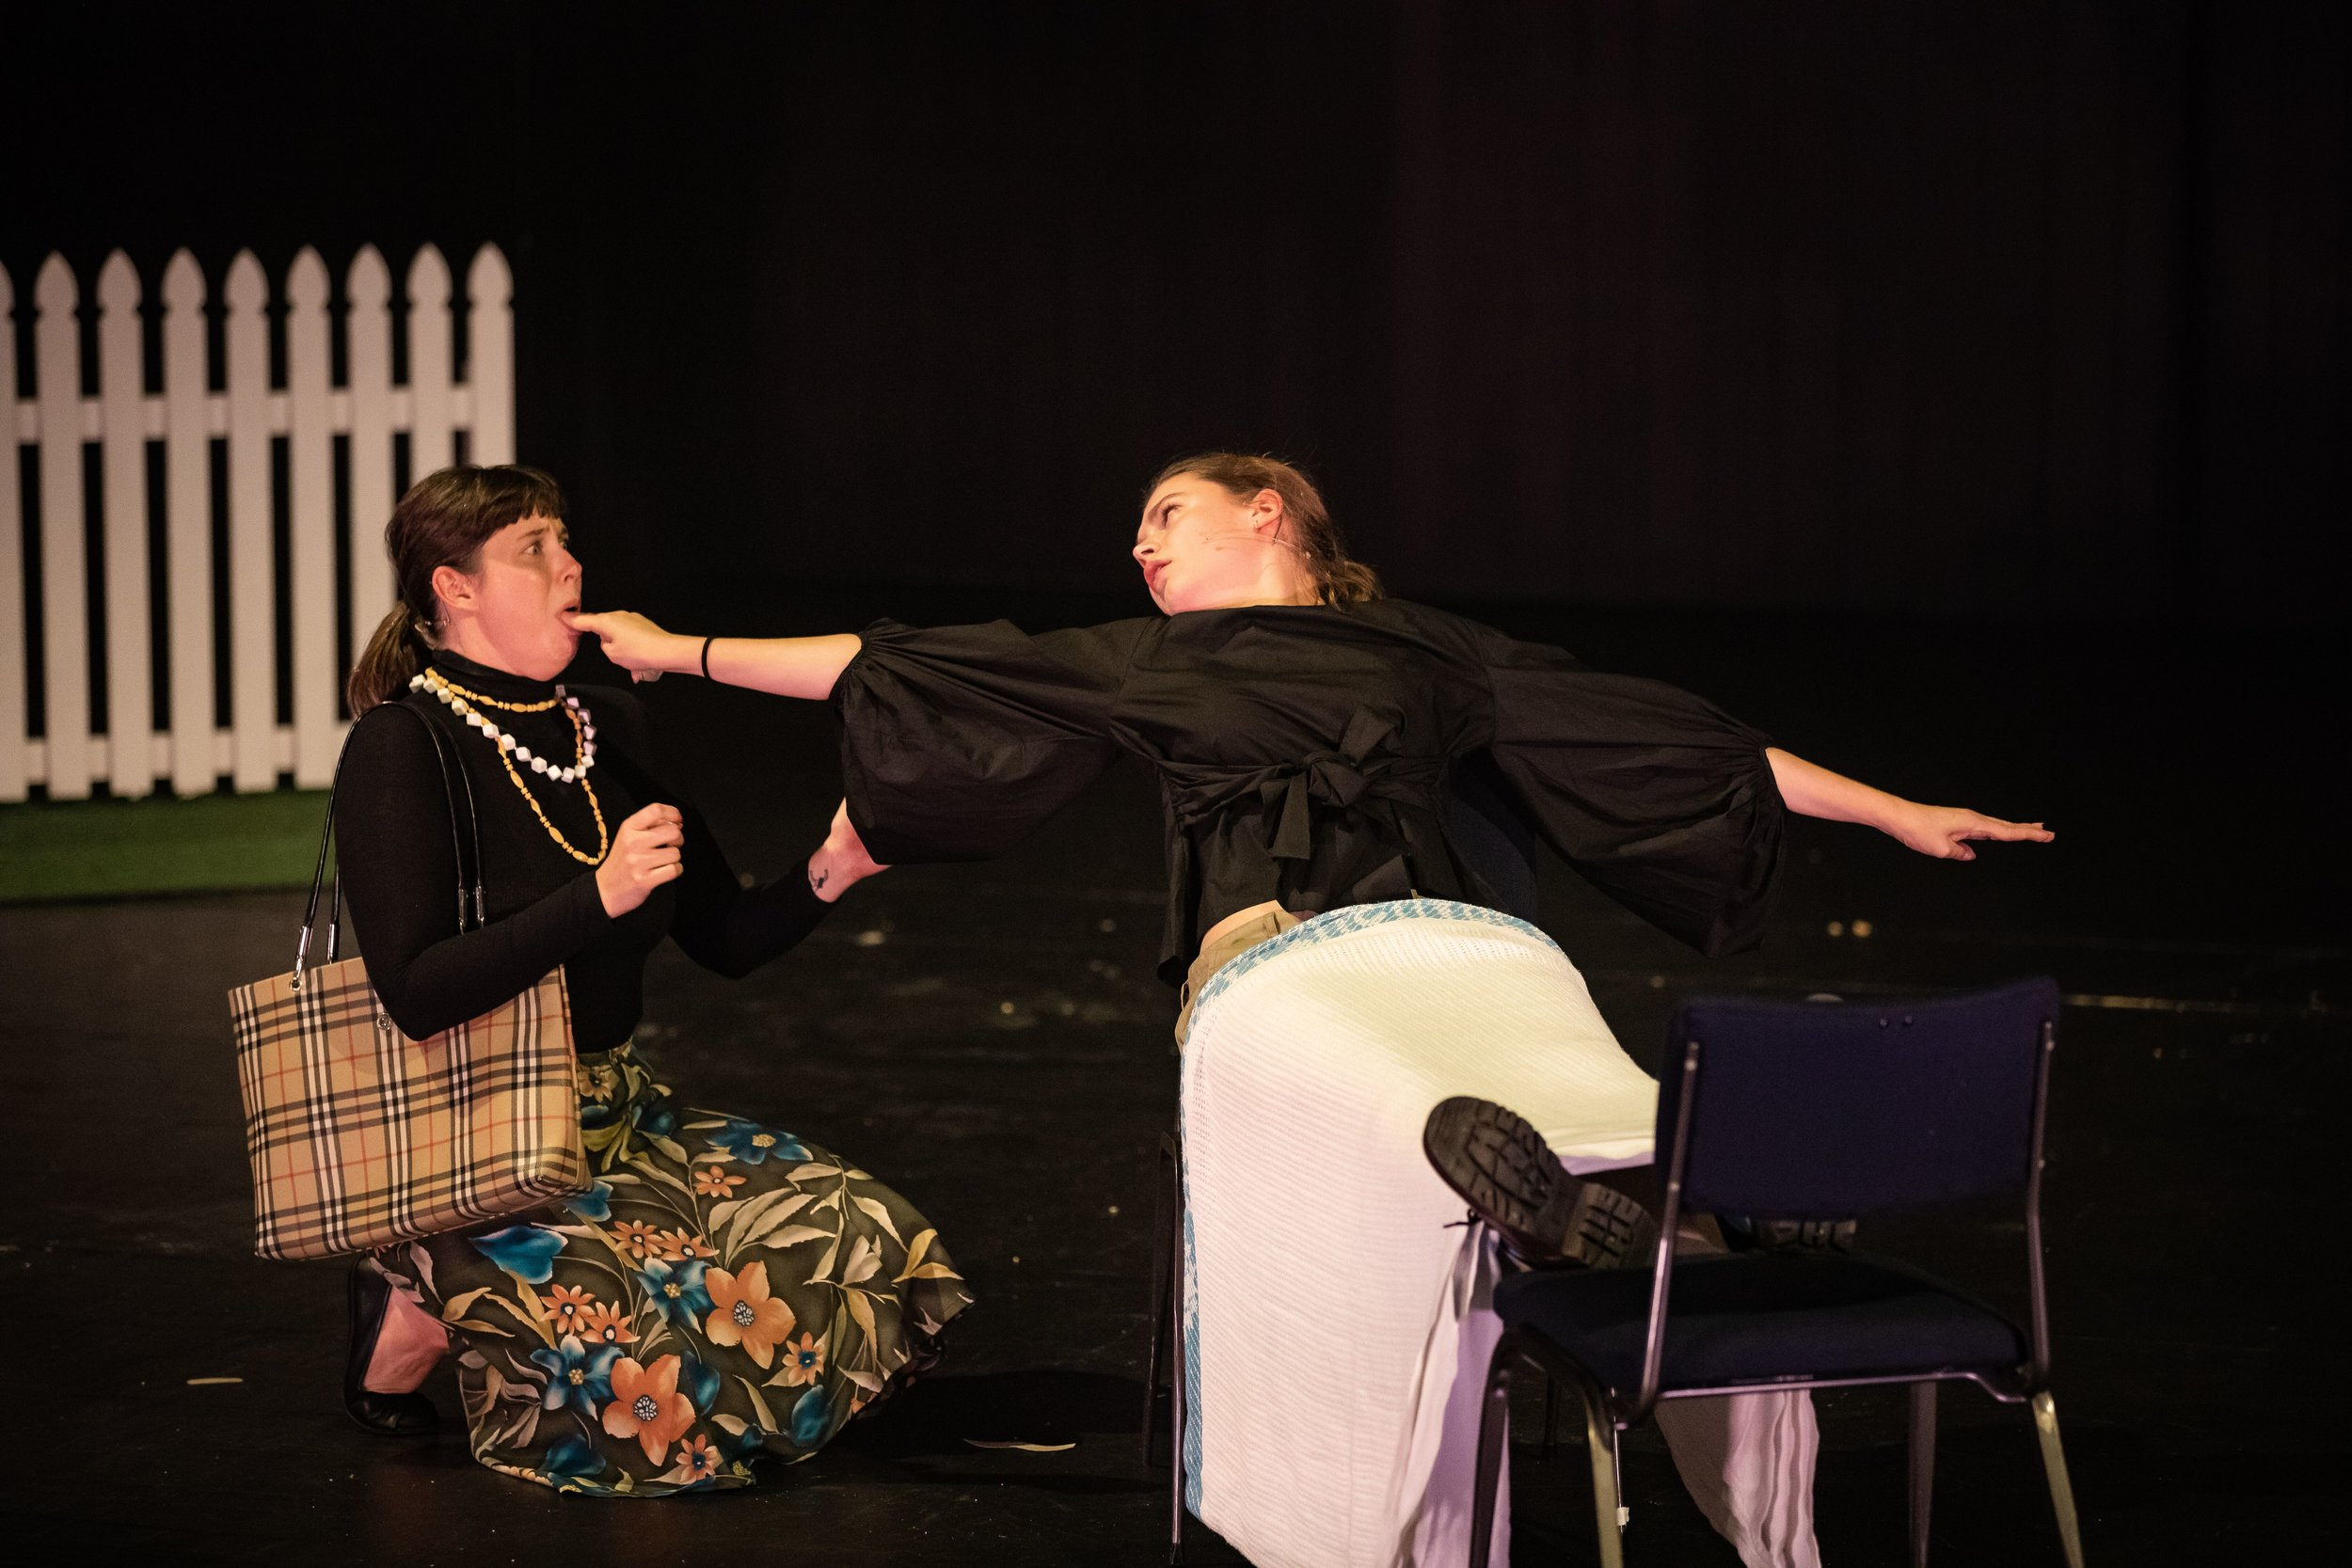 Rachael Colquhoun-Fairweather (left) and Sophia Morrison (right)